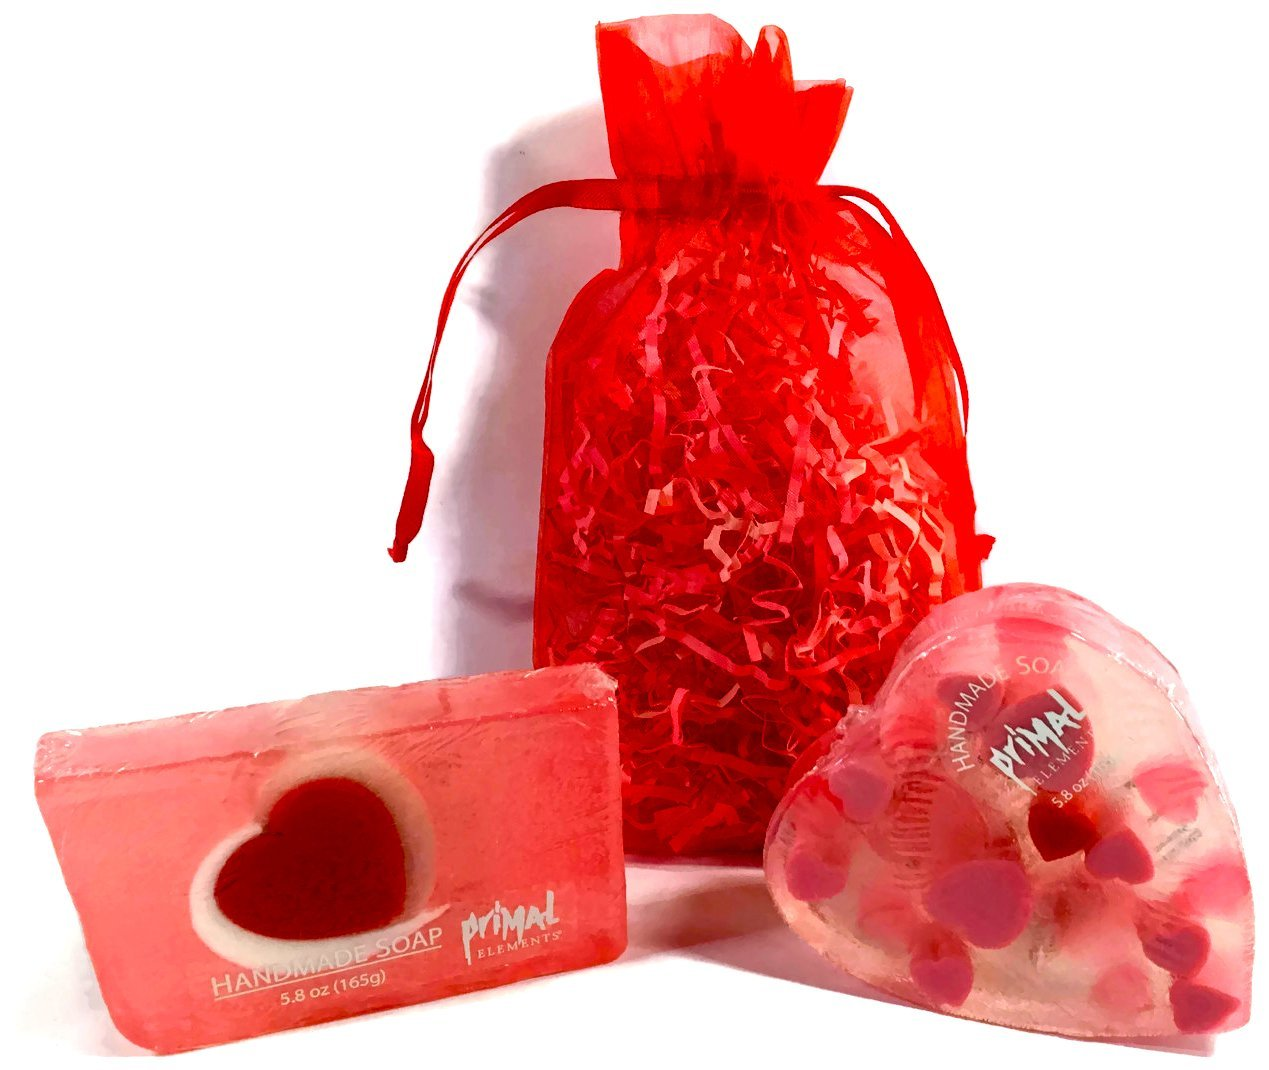 Sweetheart Glycerin Soap Set Includes 2 Primal Elements Soap Bars - Cherish Bar & Heart Shaped Bar in an Organza Gift Bag with Pretty Crinkle. Berries/Vanilla & Sandalwood/Musk.